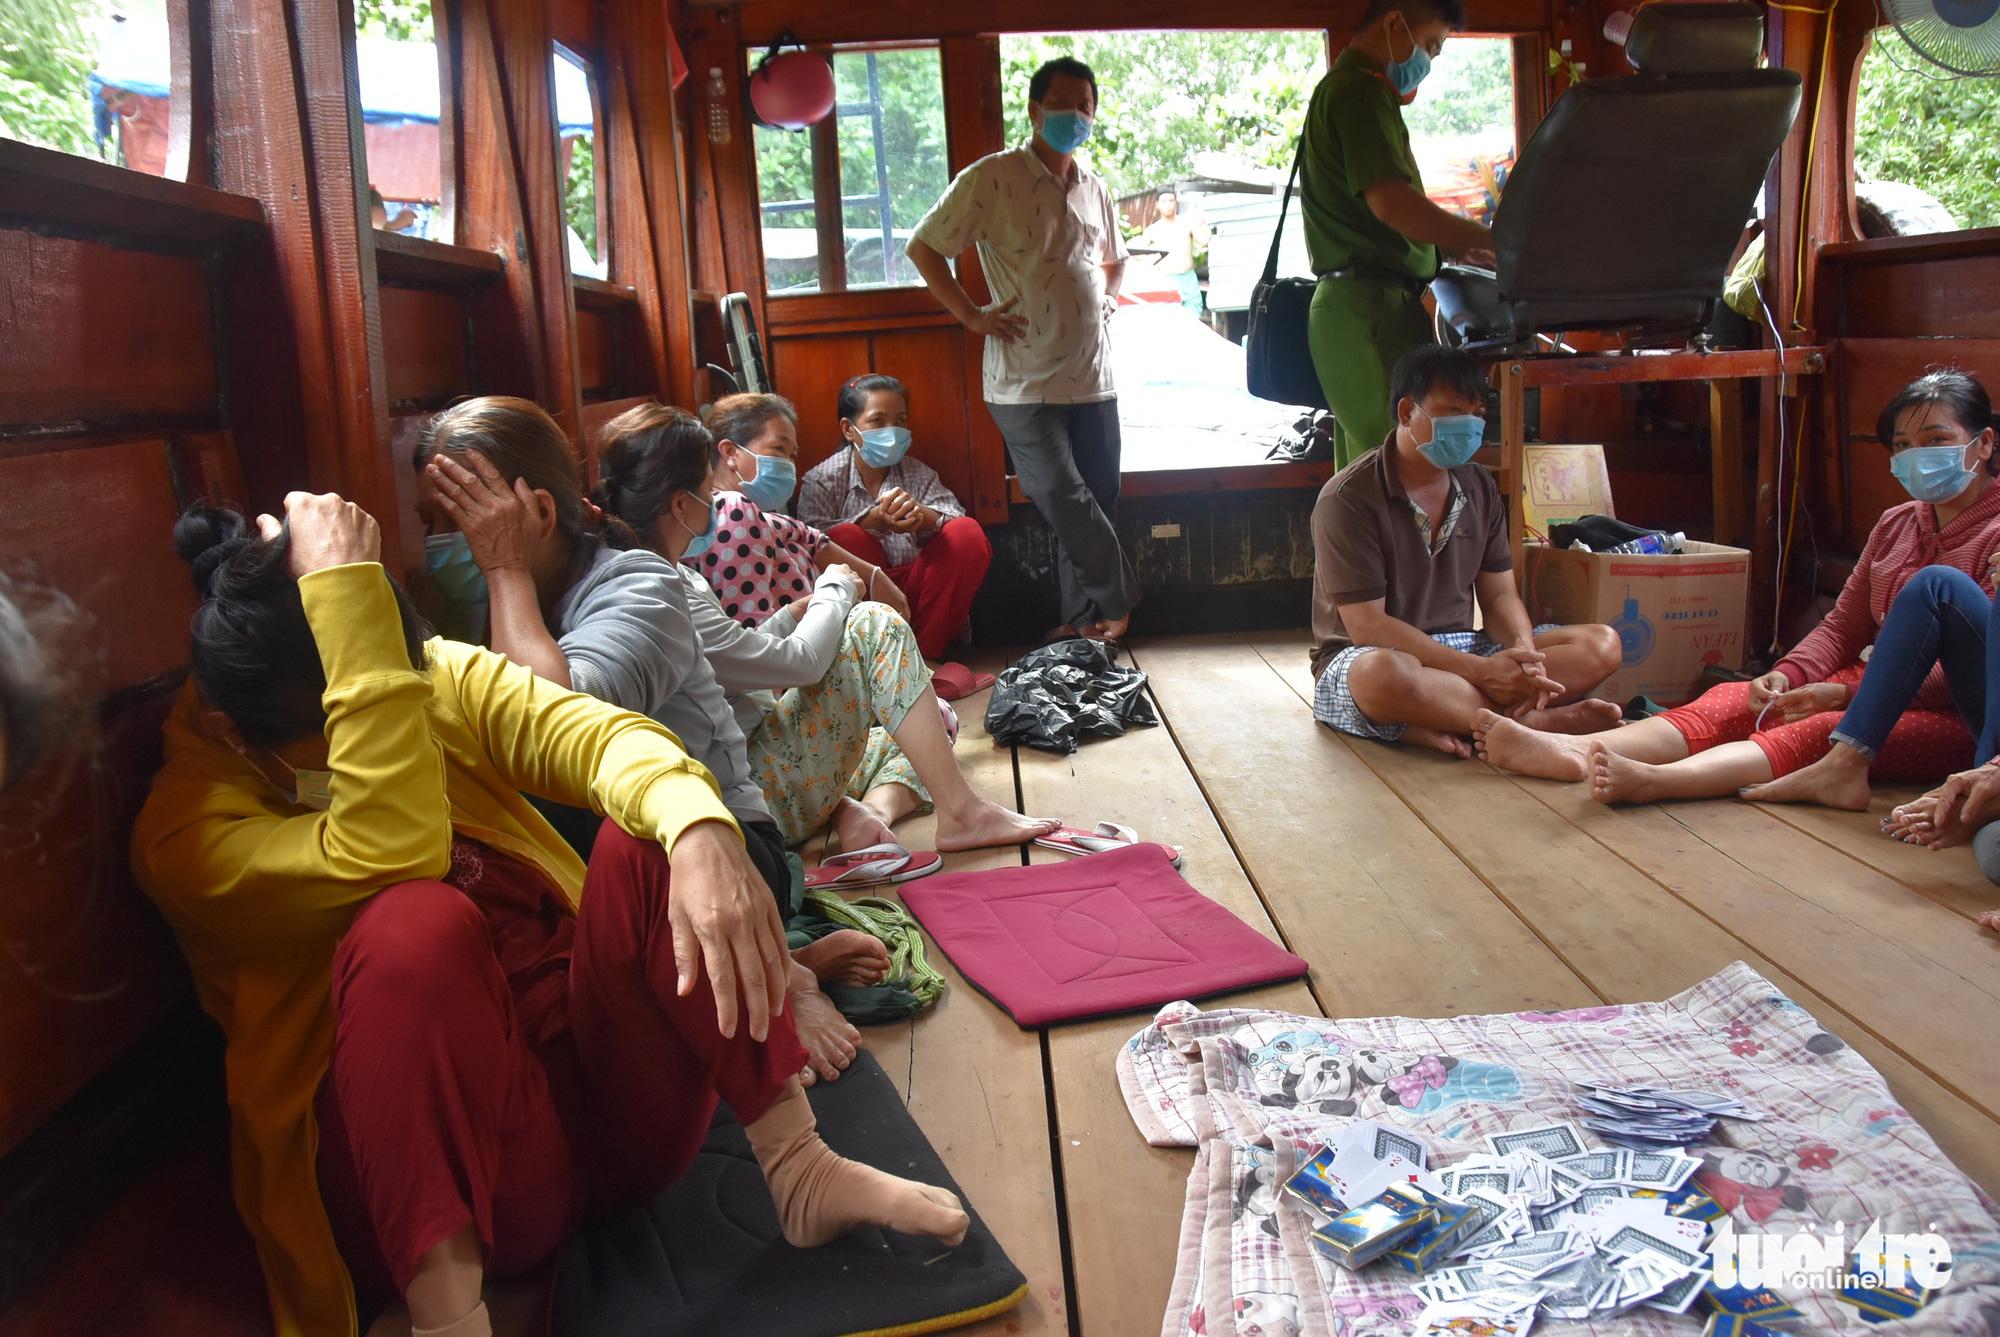 16 people caught gambling on tourist boat in Vietnam's Mekong Delta